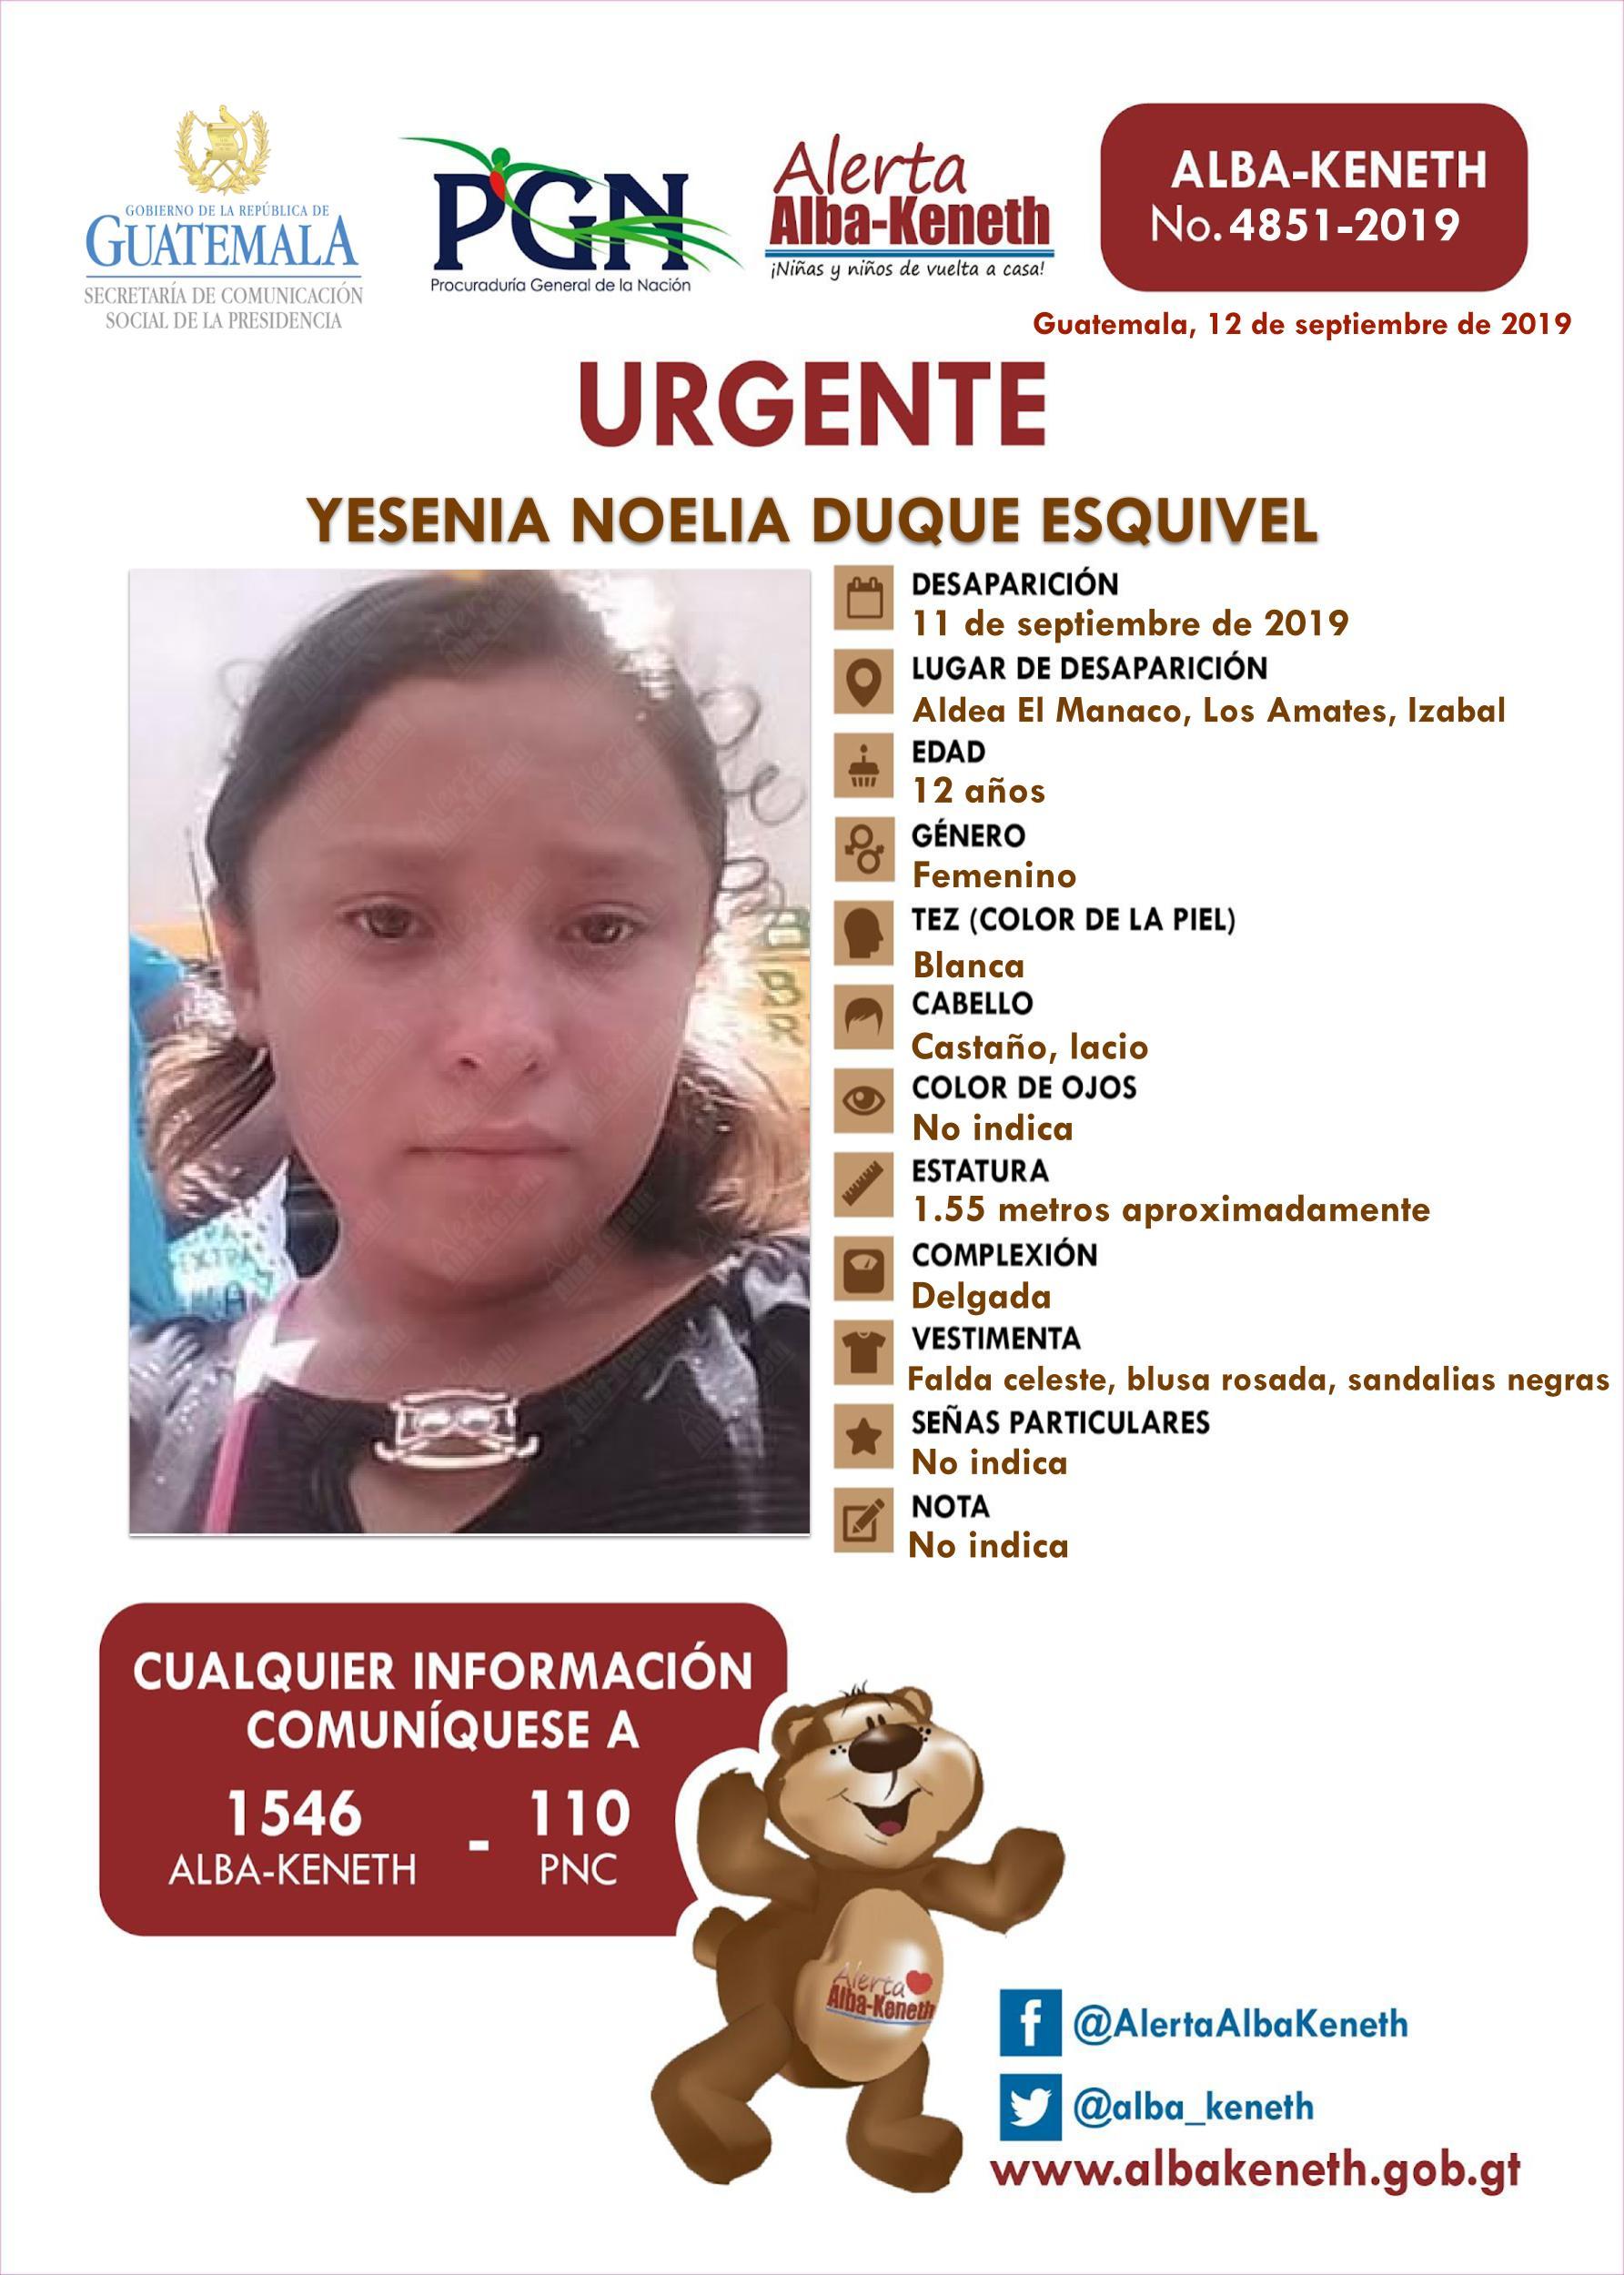 Yesenia Noelia Duque Esquivel